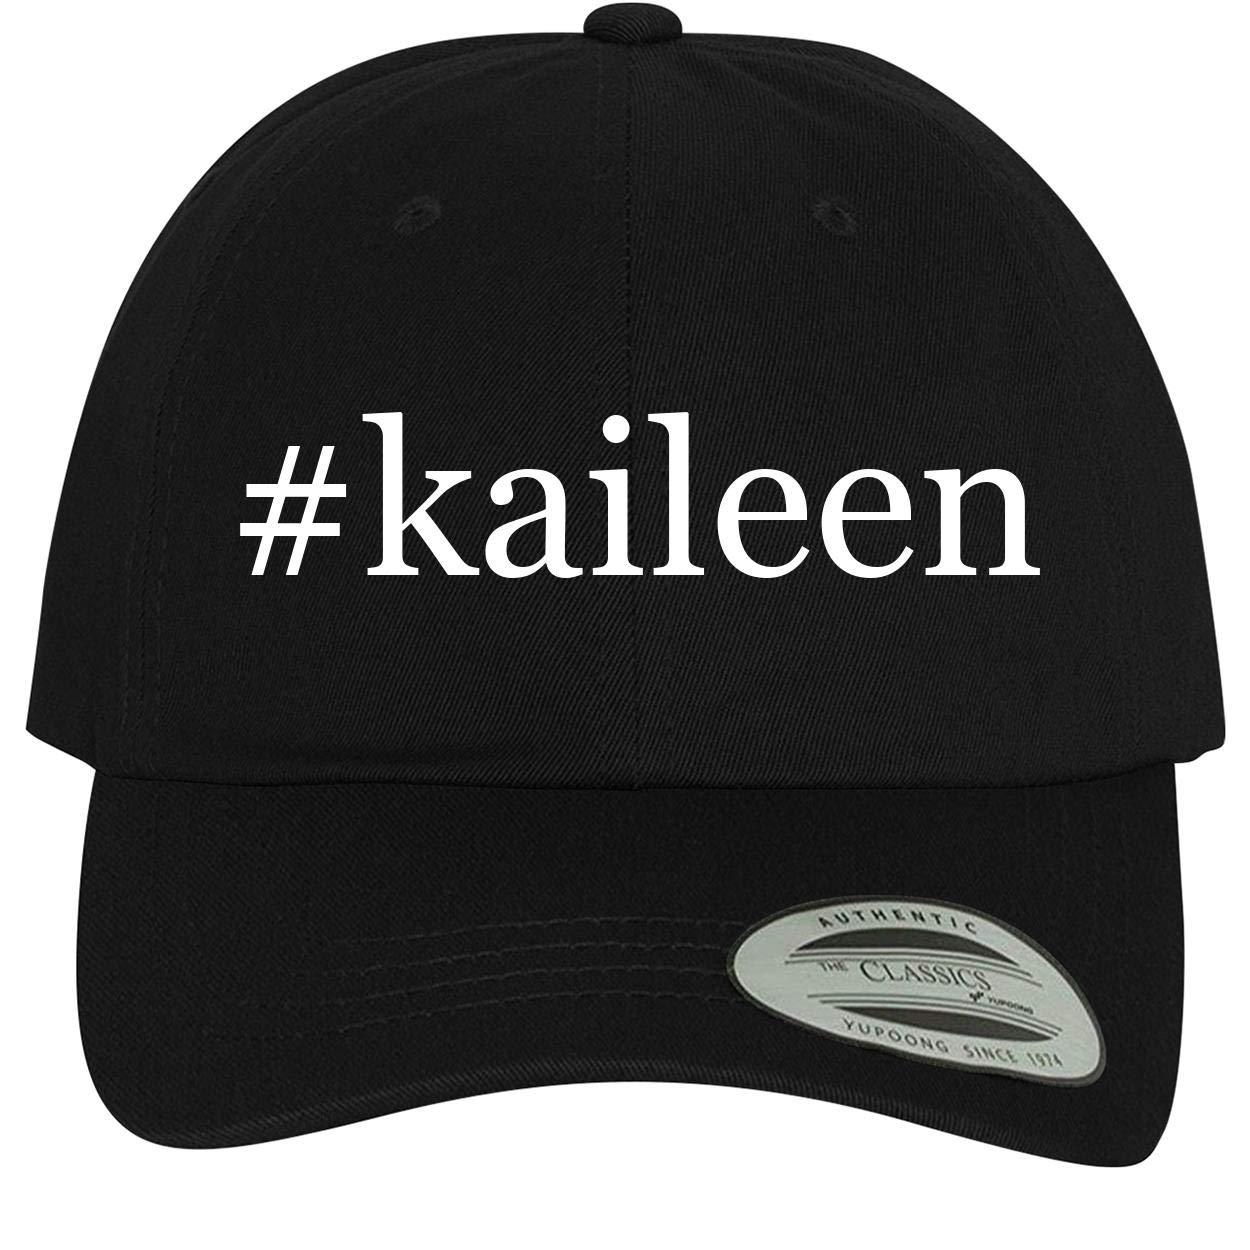 Comfortable Dad Hat Baseball Cap BH Cool Designs #Kaileen